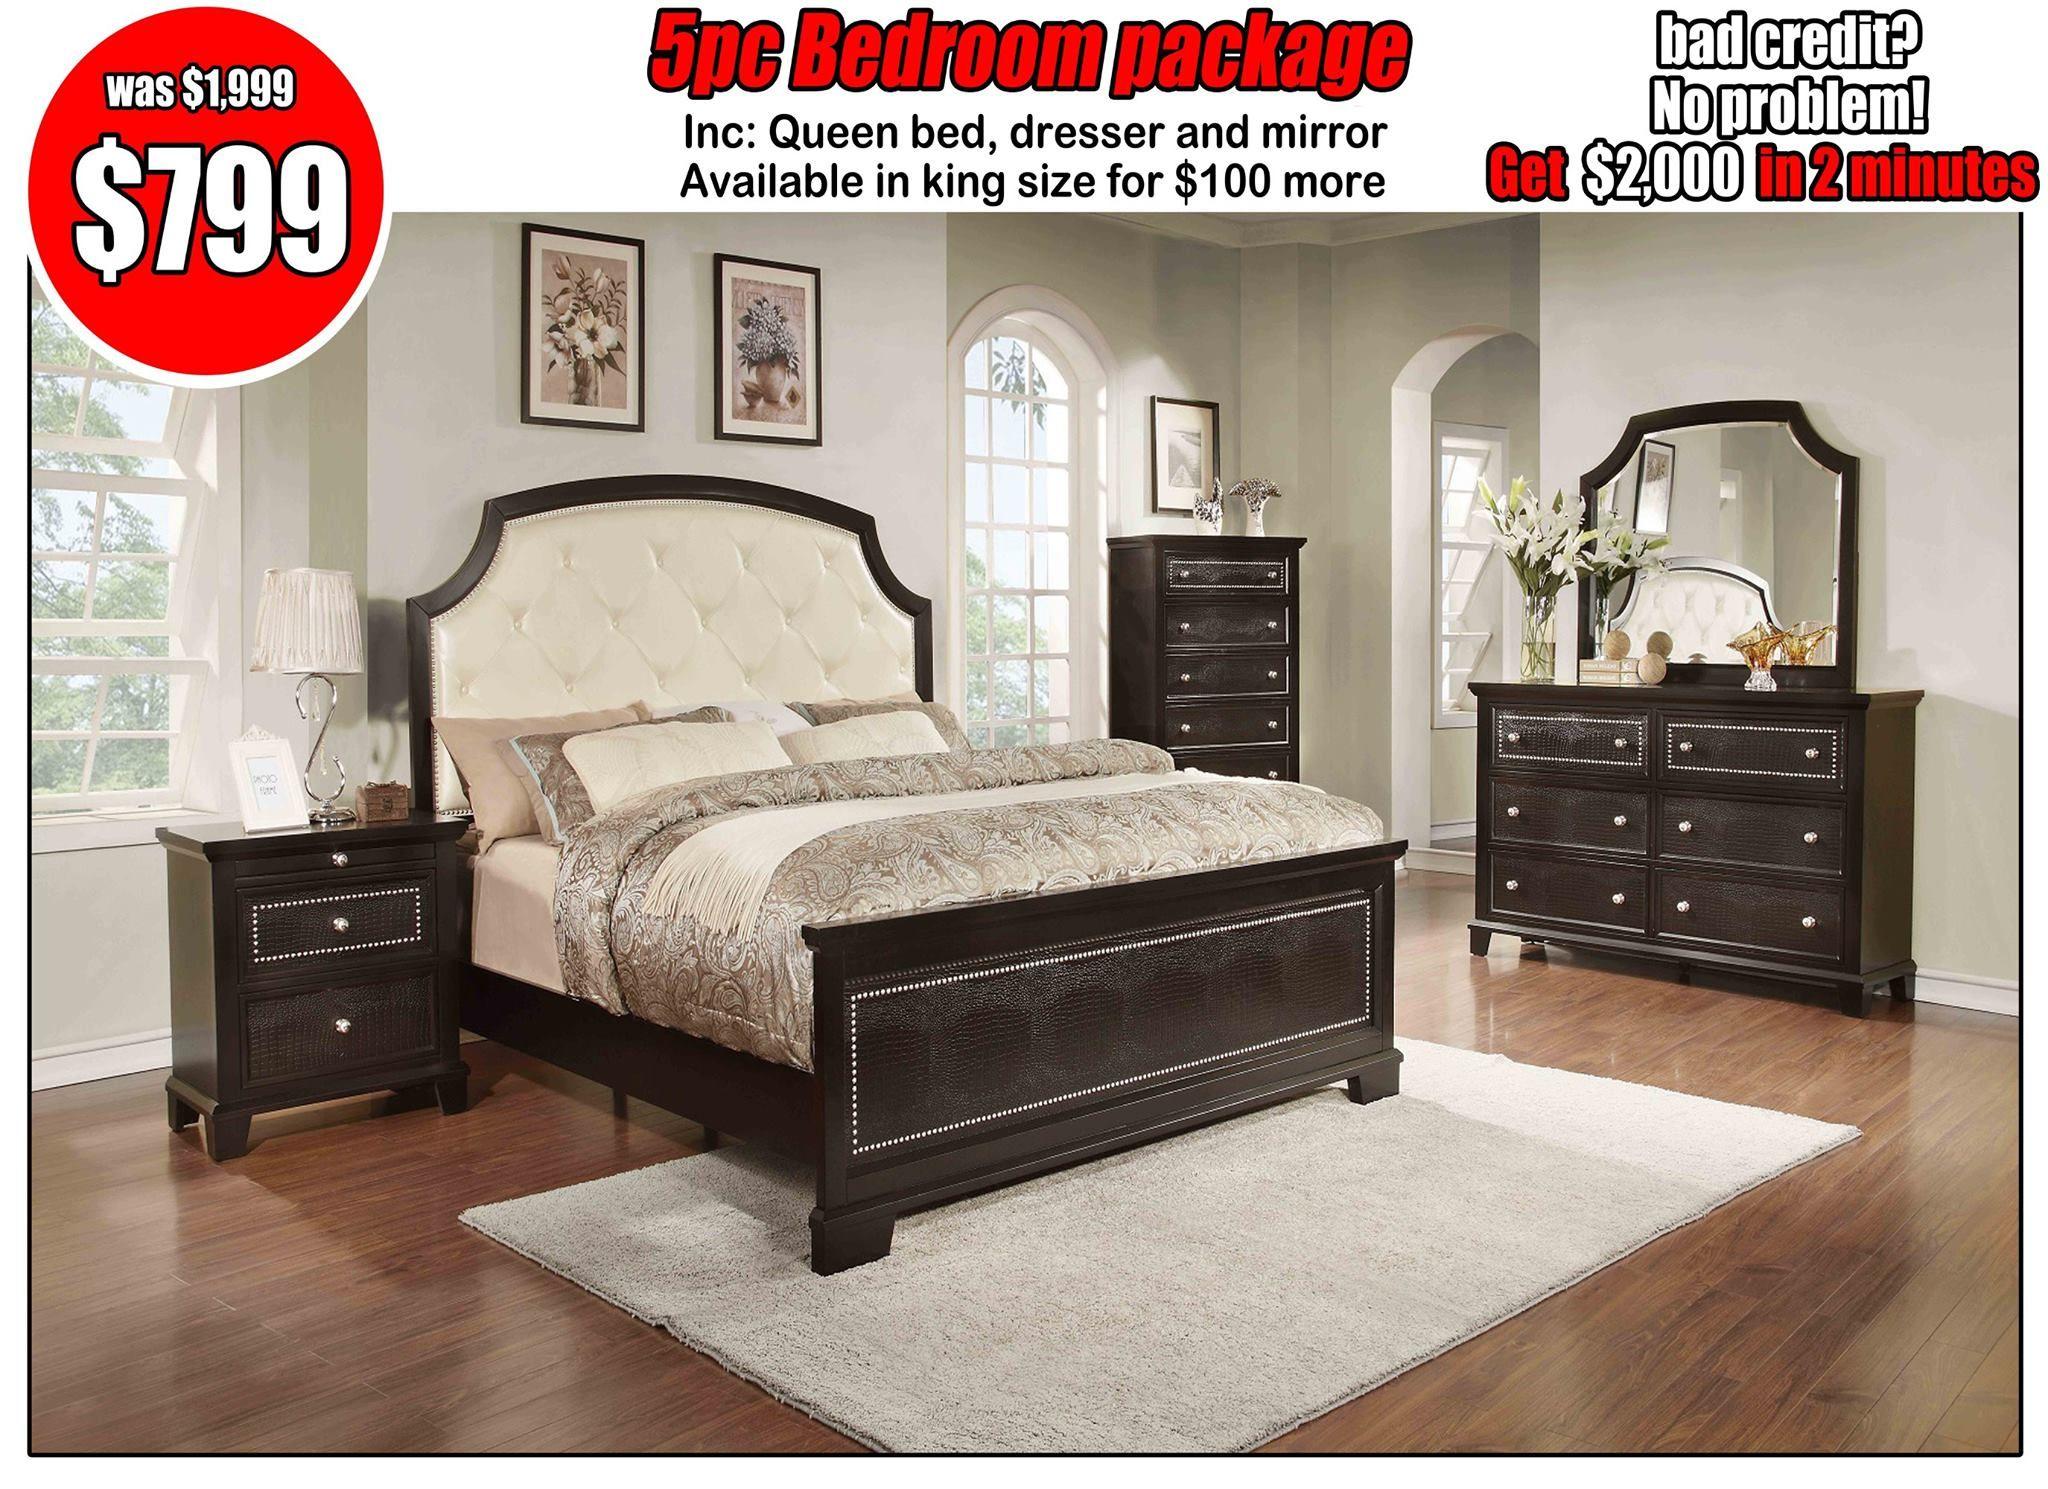 Pin de Best Buy Furniture en Check out our best sellers   Pinterest